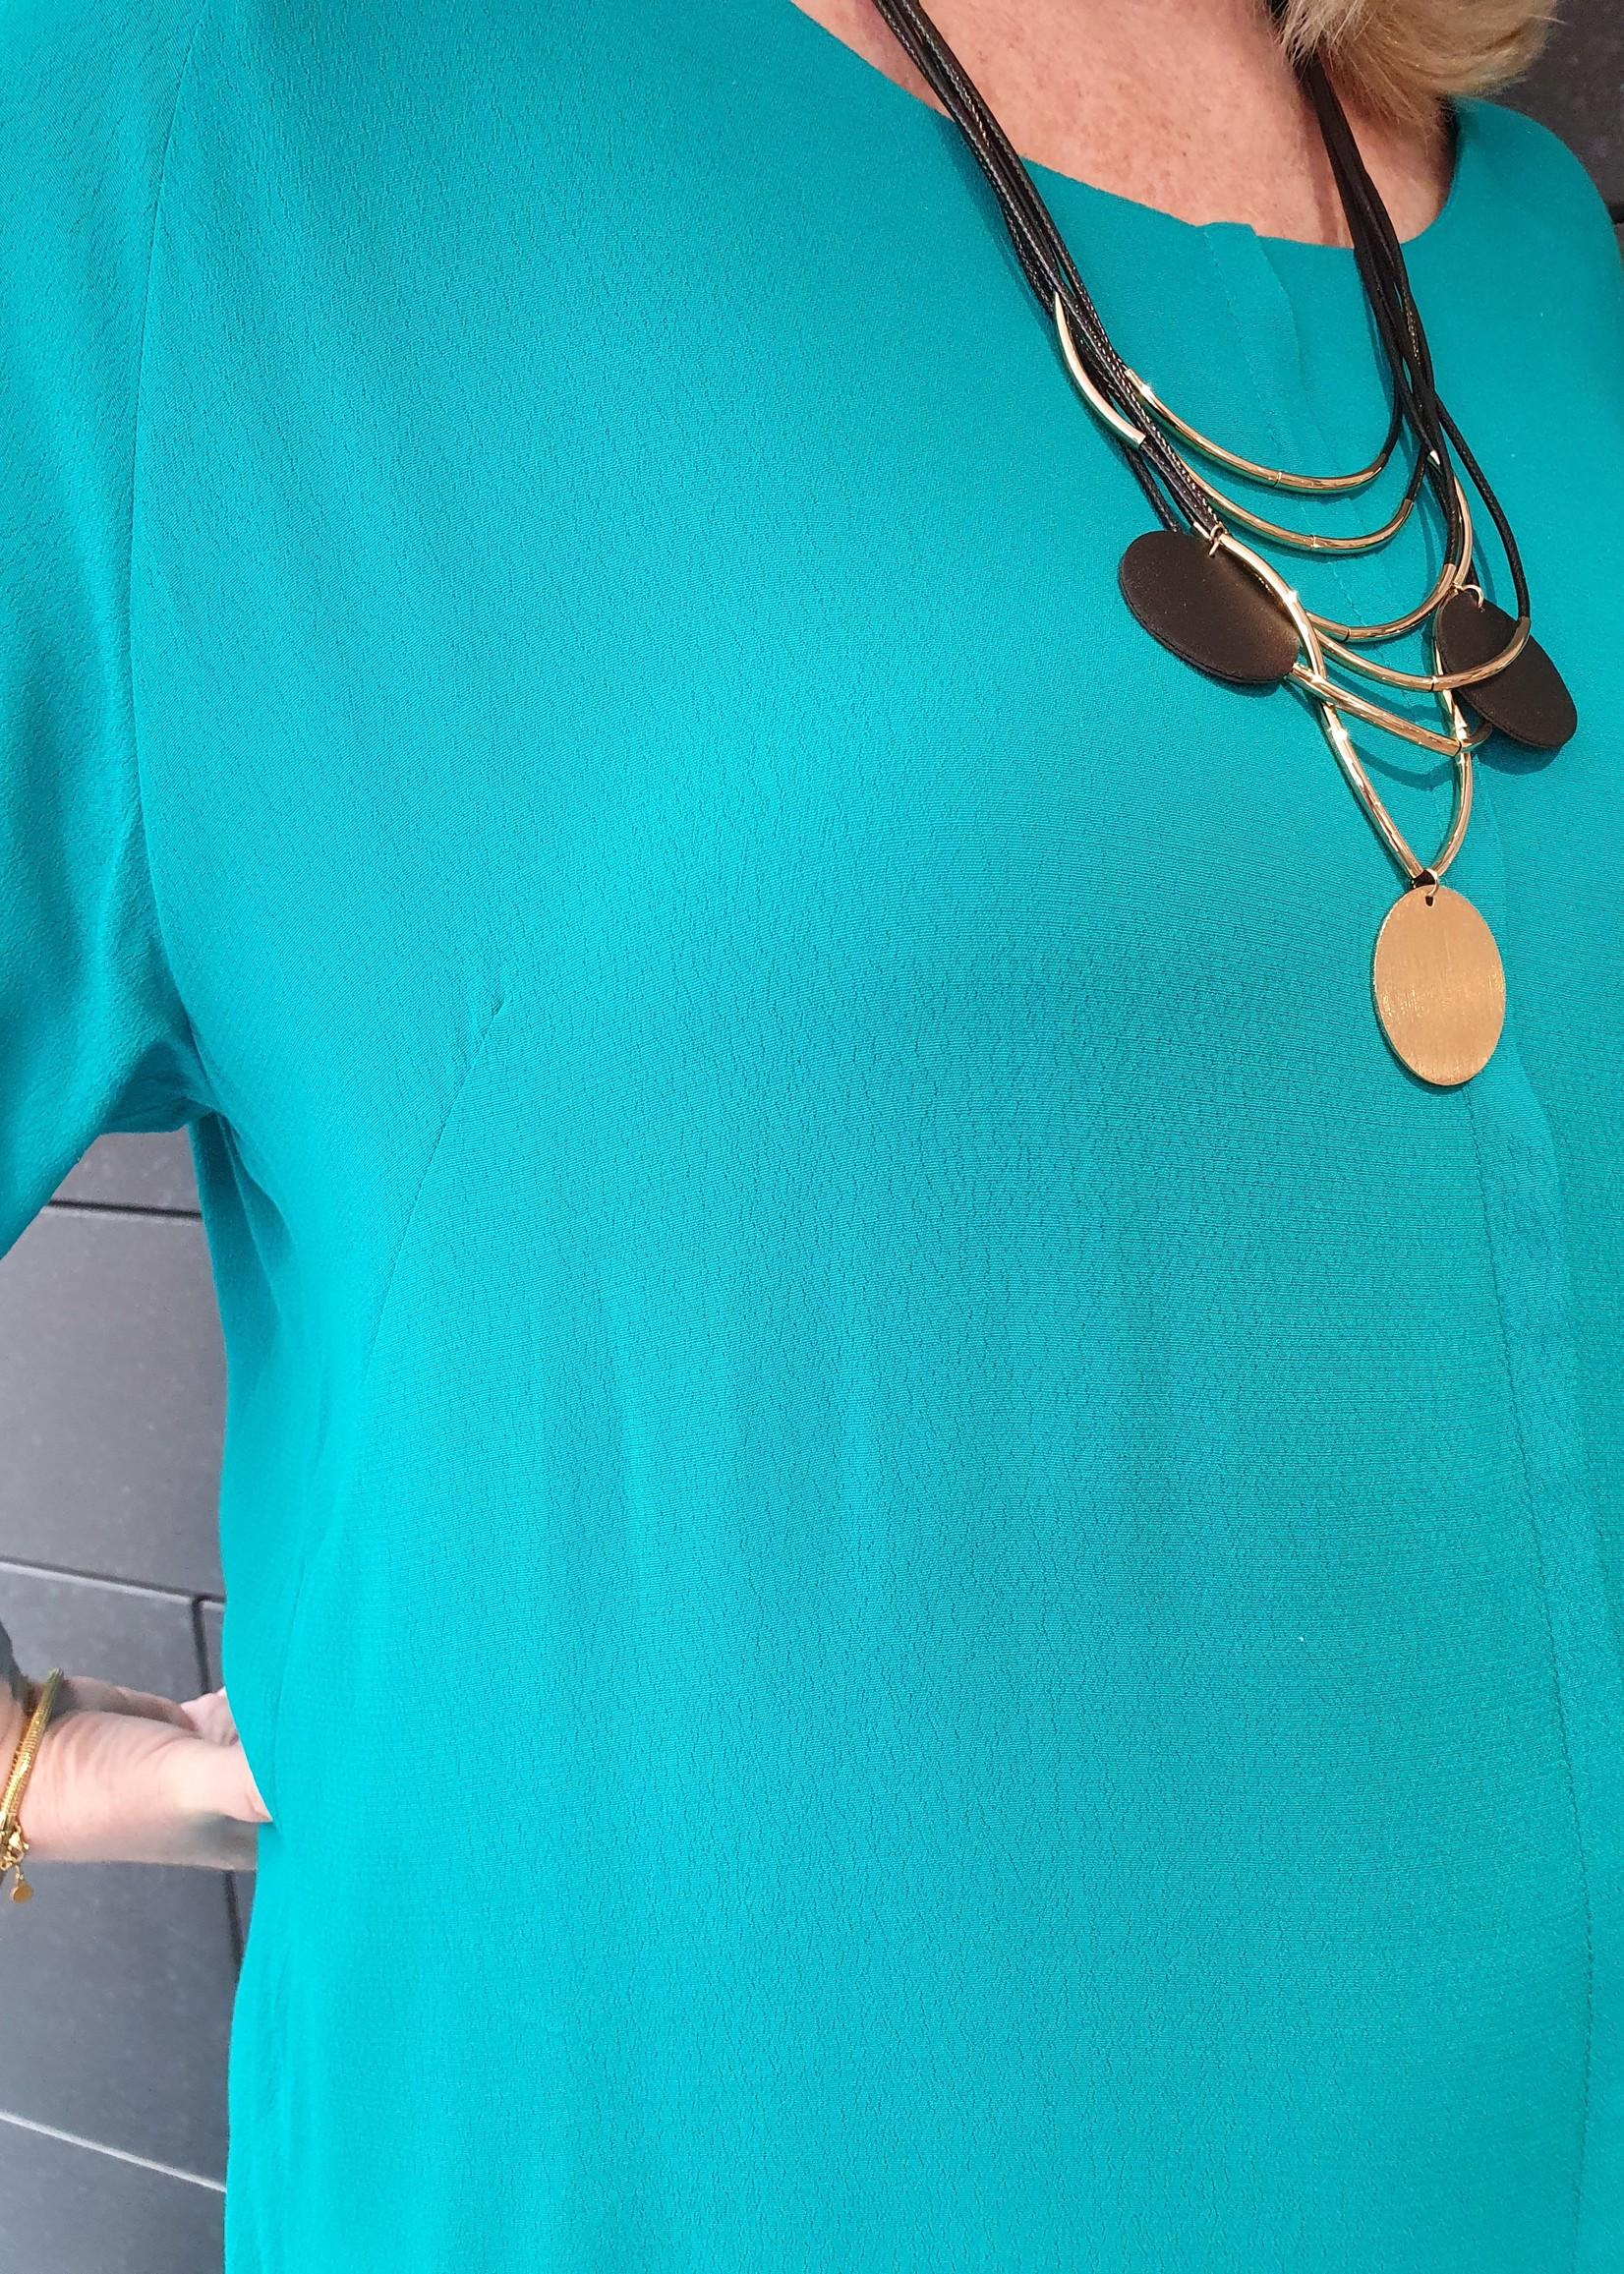 Ophilia Ophilia Pip Dress